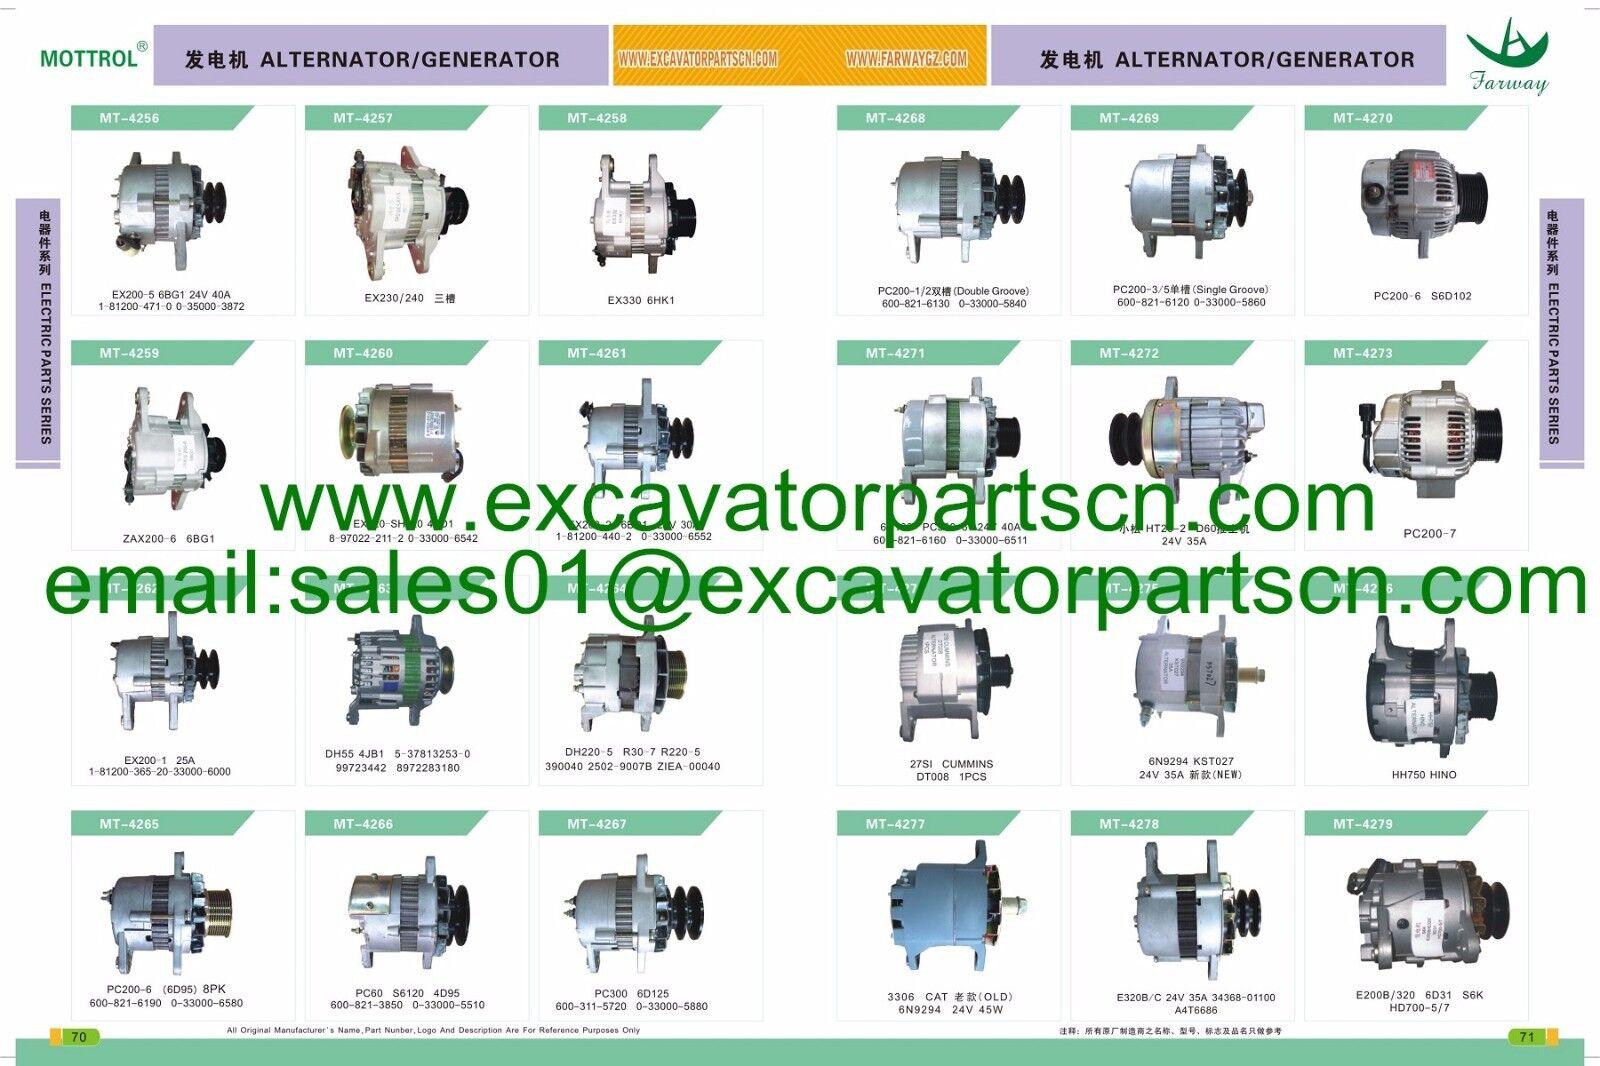 M806808 Fuel Shut Off Shutdown Solenoid John Deere Hpx Xuv Gator Pump Wiring Diagram Tractor Mower Ebay